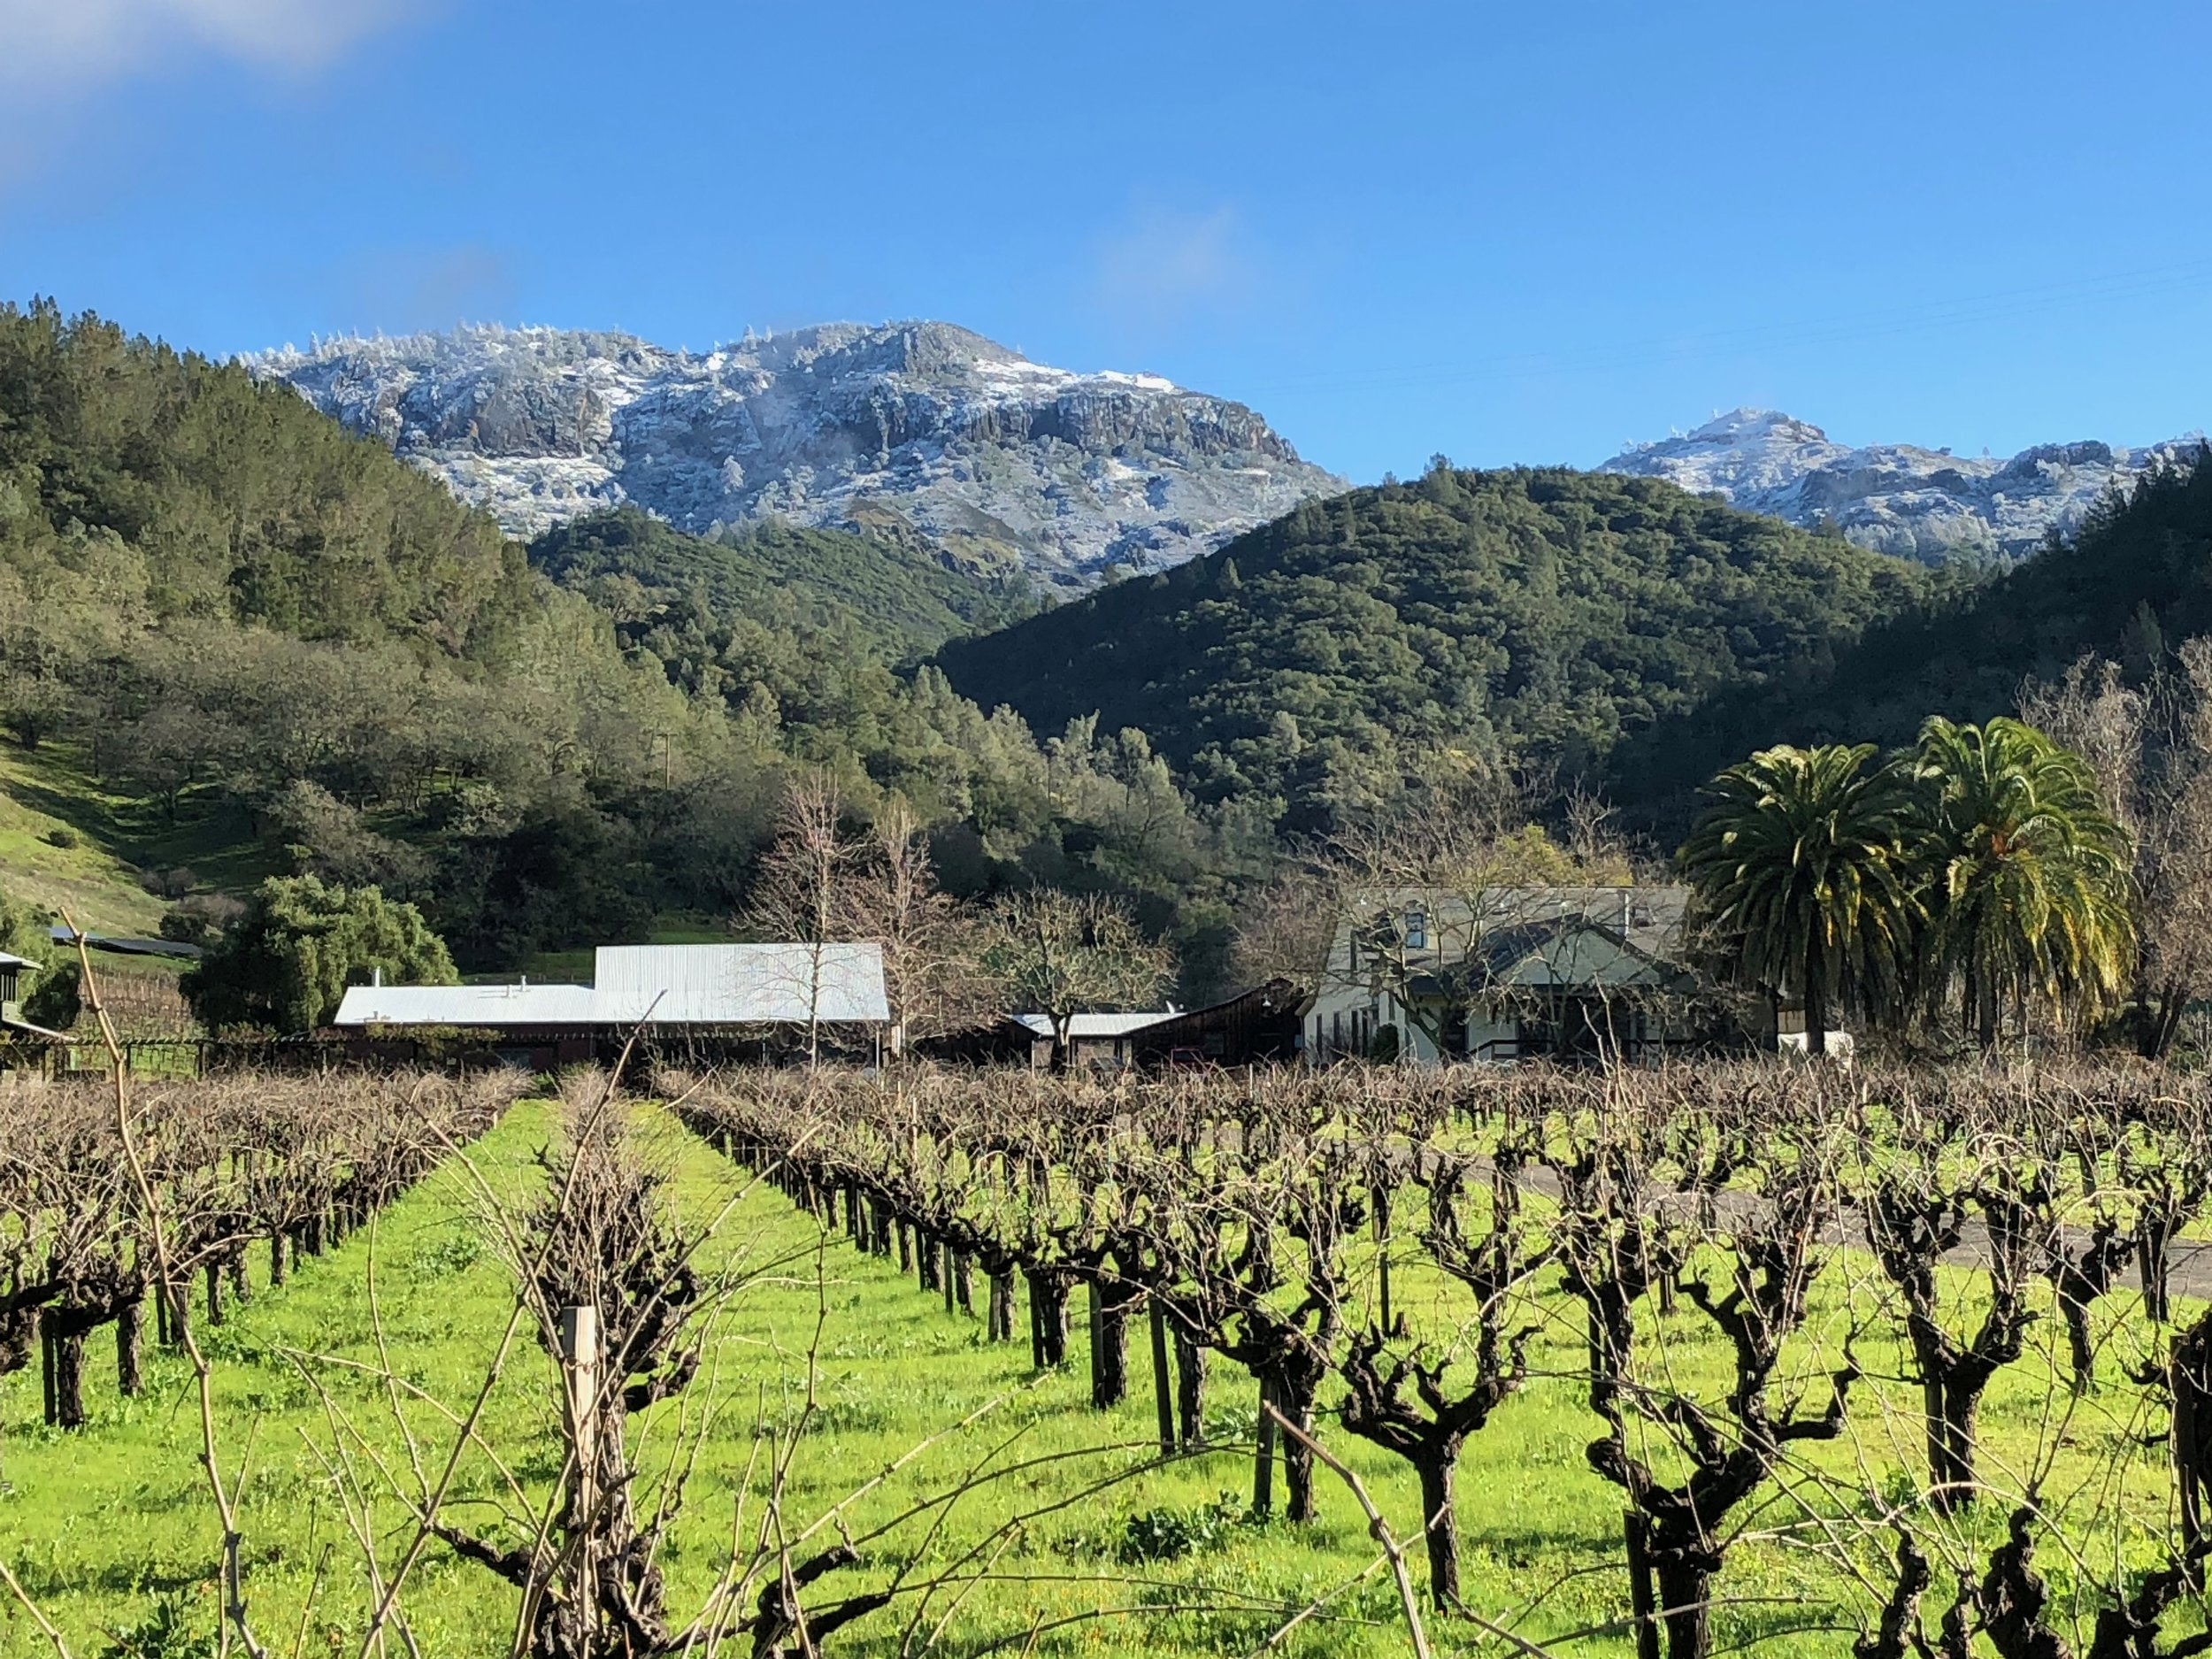 The Palisades above the vineyard after a rare winter snowfall